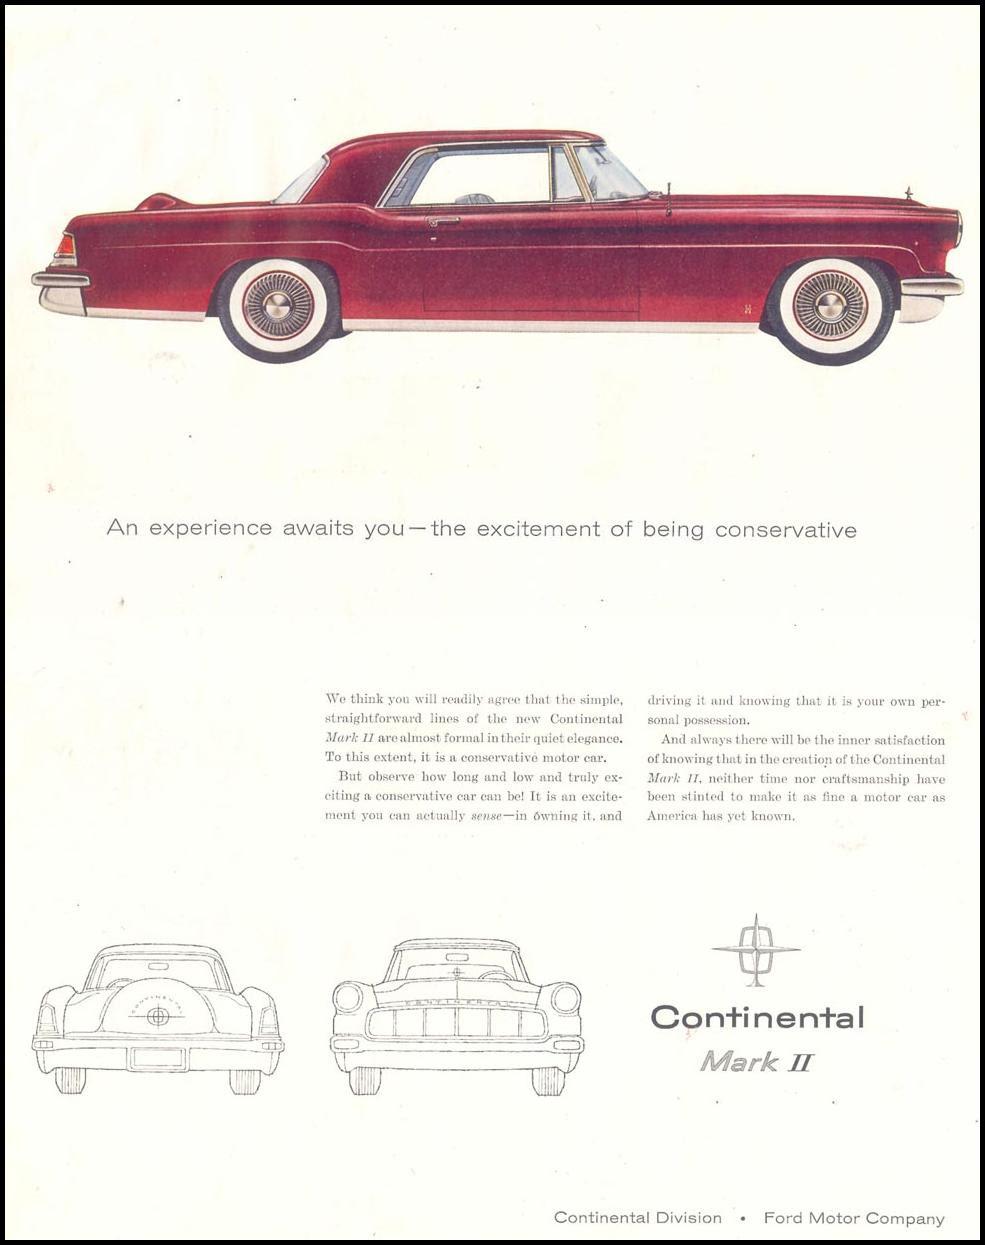 CONTINENTAL AUTOMOBILES SATURDAY EVENING POST 12/10/1955 p. 53